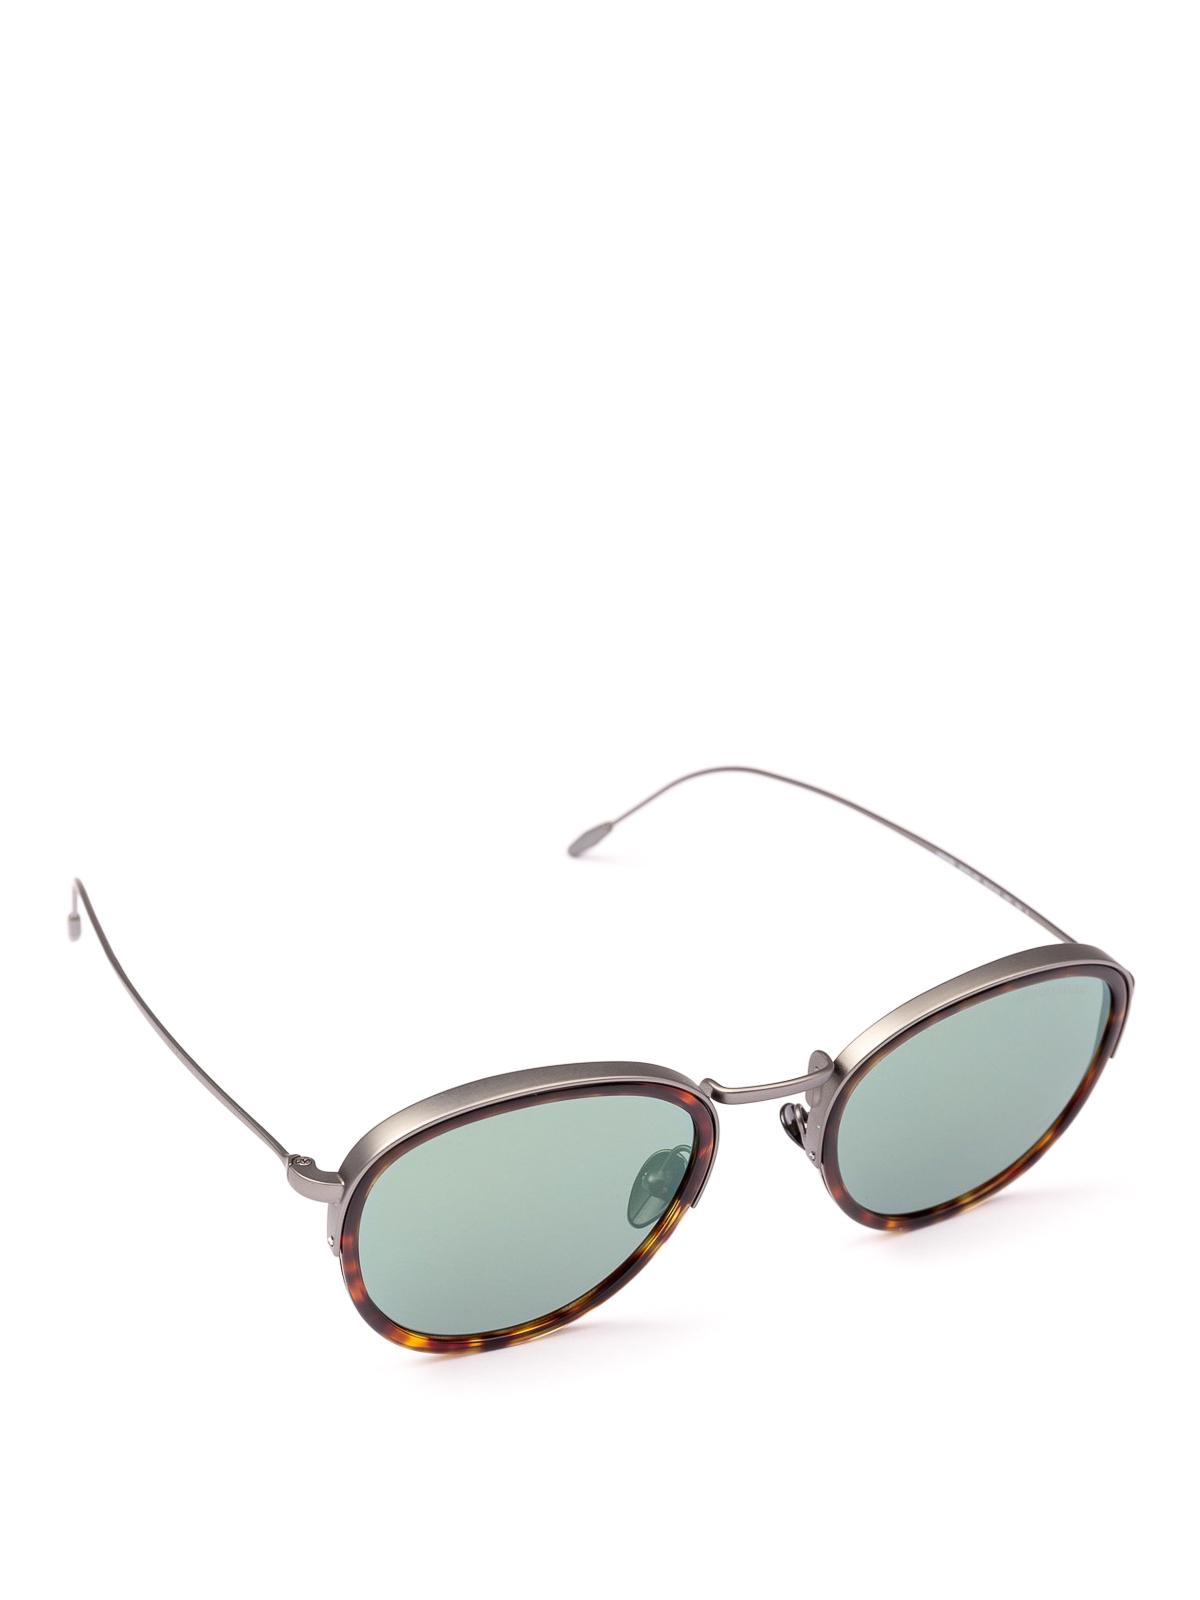 5fdbb5b8cb99 Giorgio Armani - Double frame round sunglasses - sunglasses - AR6068 ...